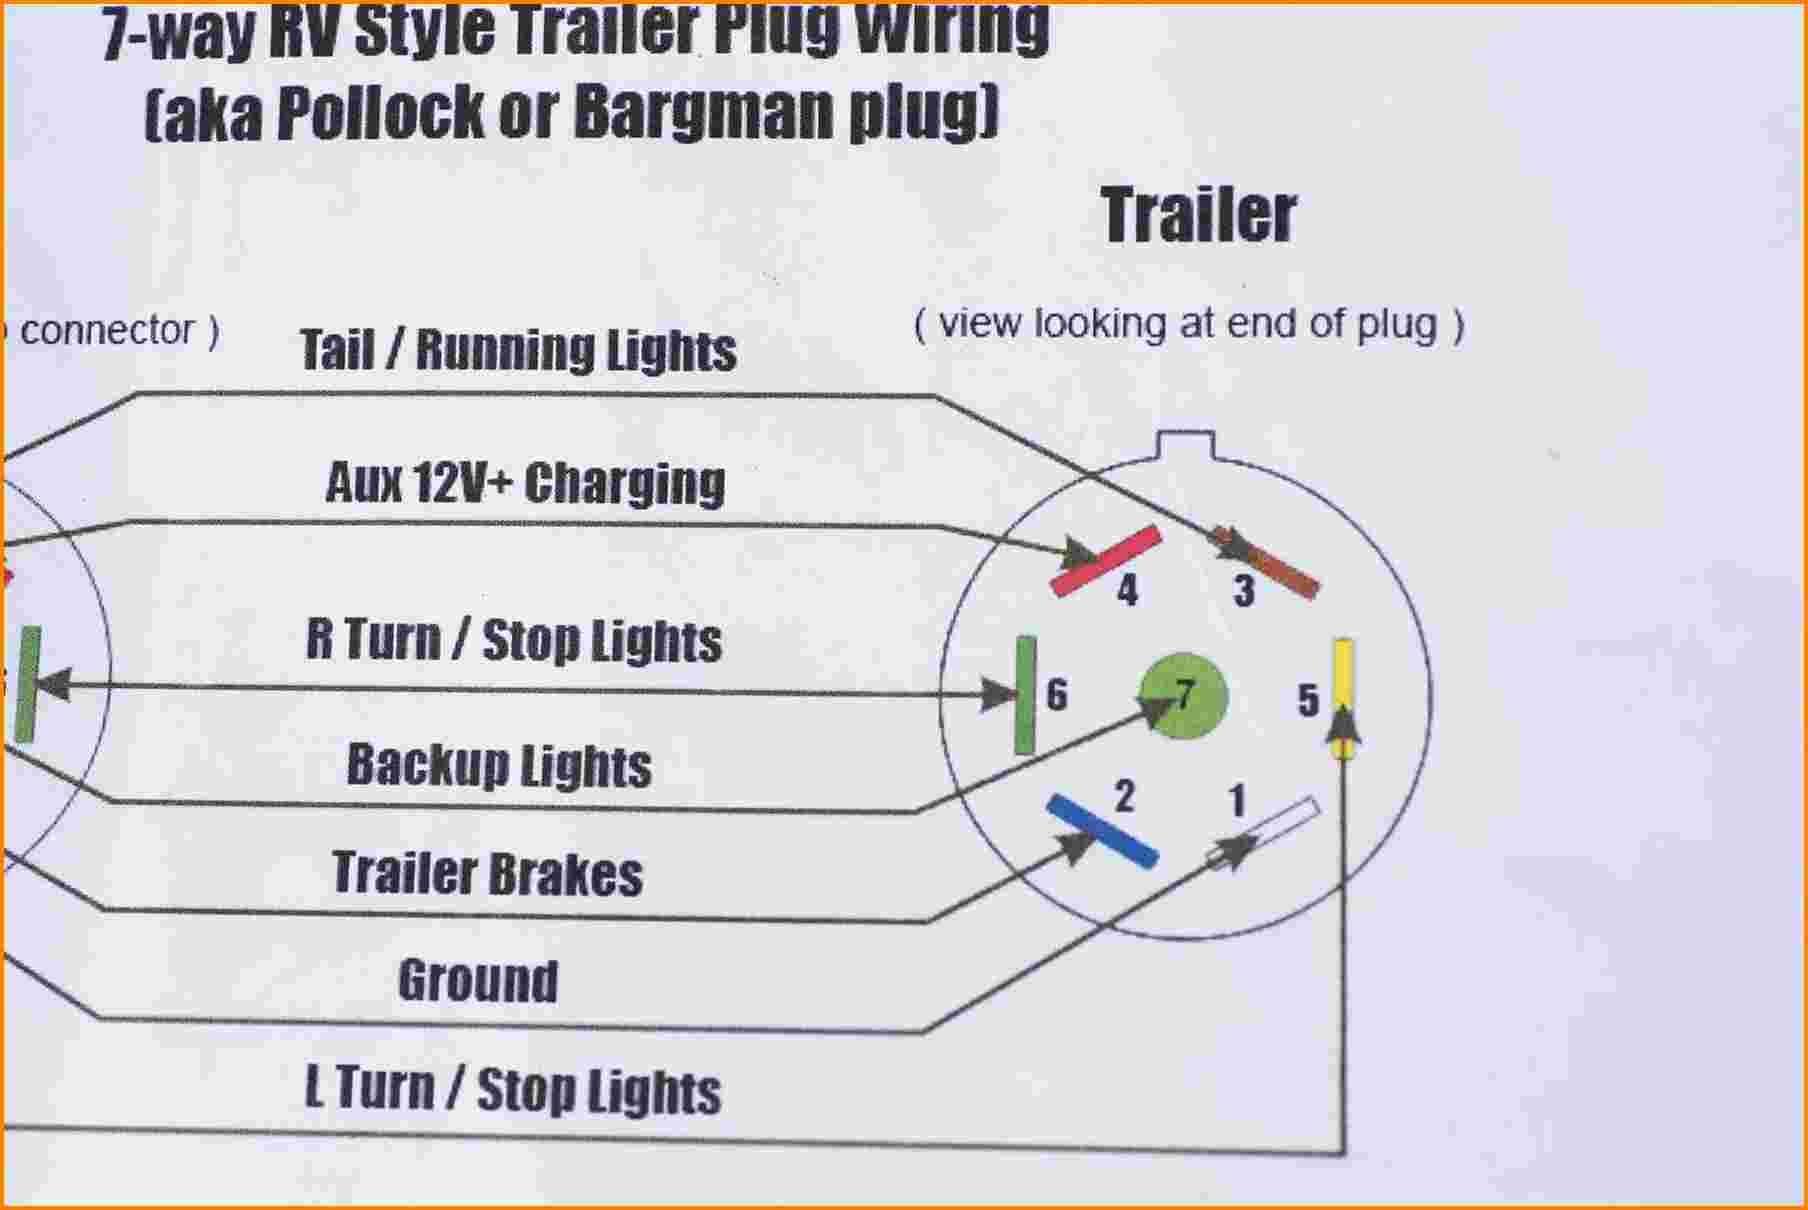 5 Pin Trailer Socket Wiring Diagram, Hopkins 7 Pin Trailer Harness Wiring Diagram